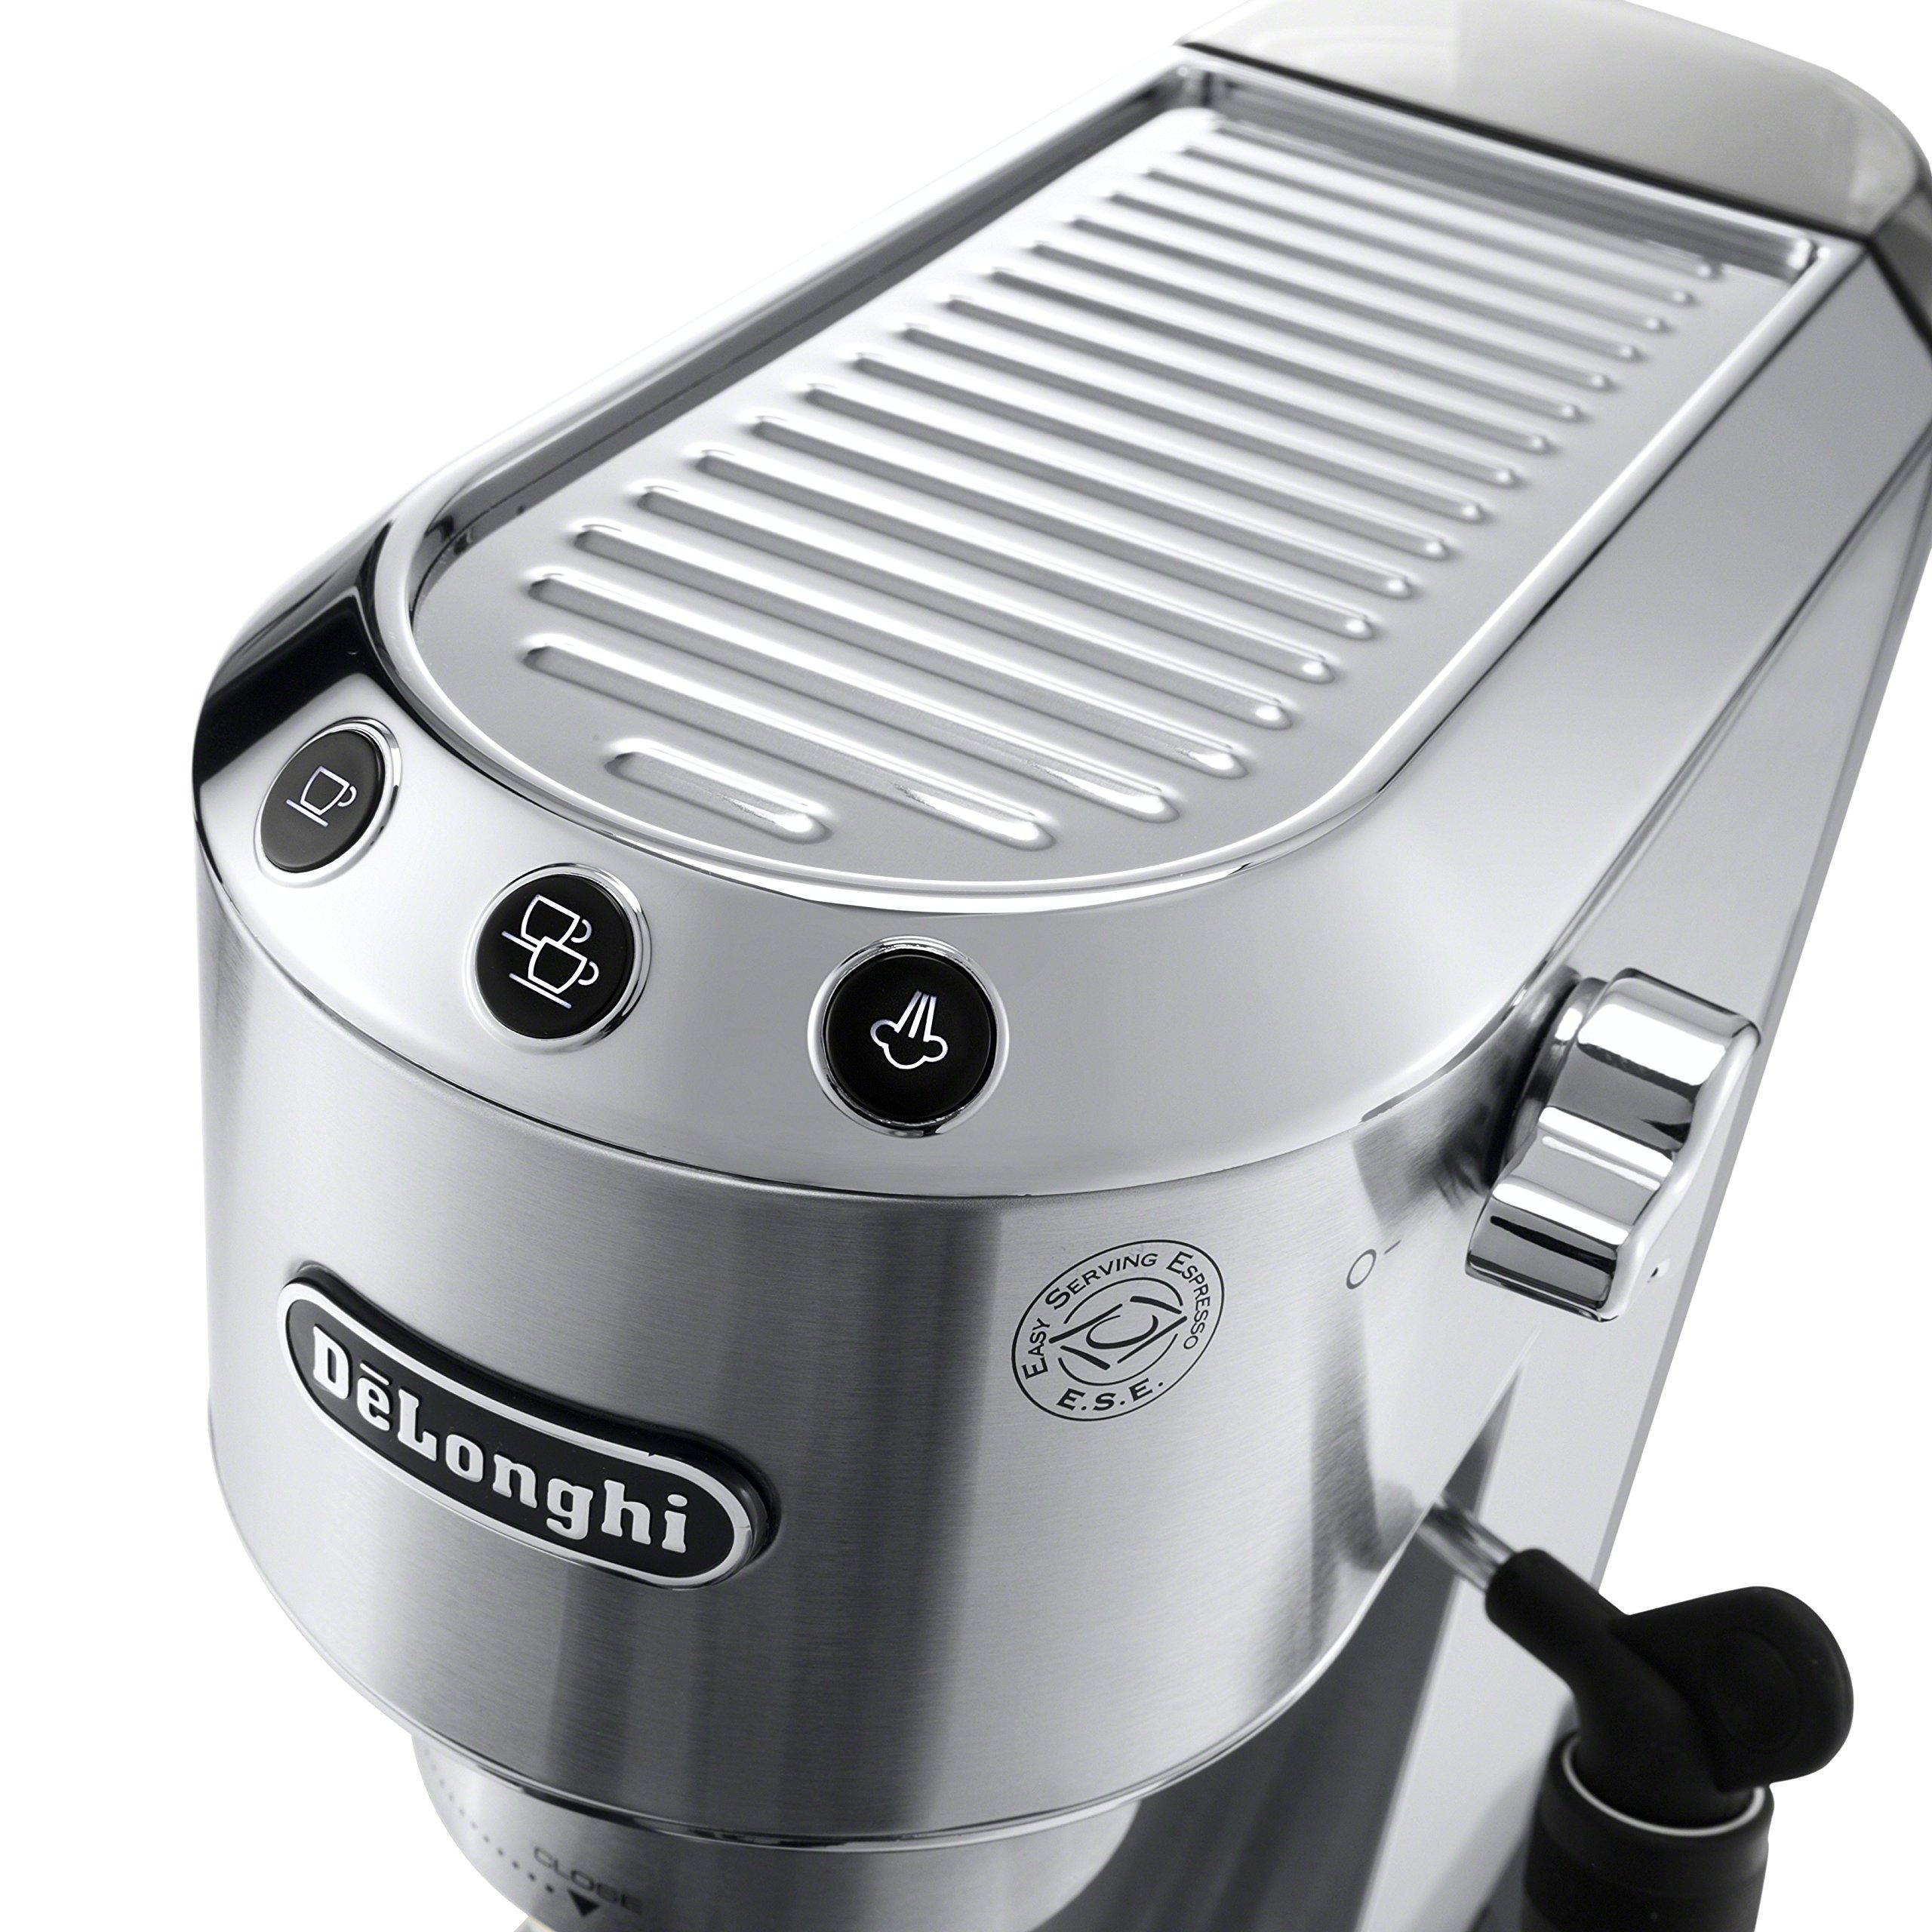 DeLonghi America, Inc EC685M Dedica Deluxe espresso, Silver by DeLonghi America, Inc (Image #4)